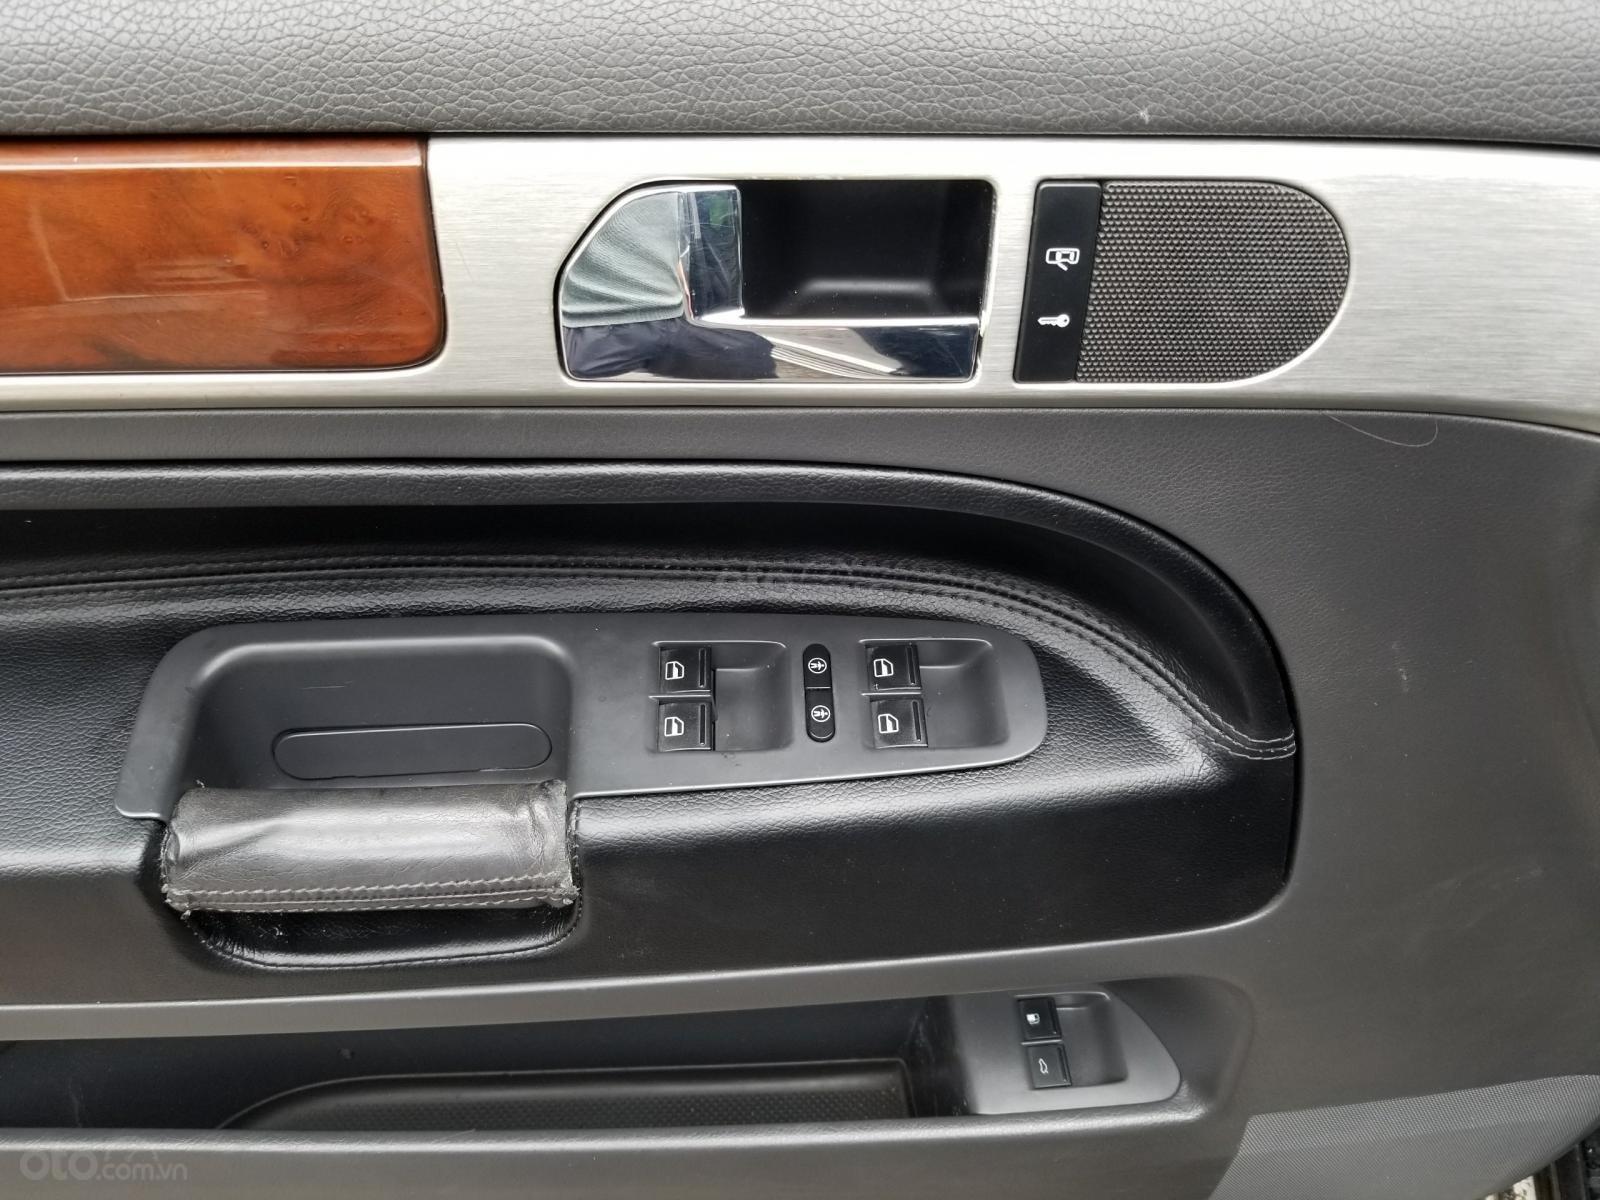 Cần bán Volkswagen Touareg model 2009, màu đen, máy dầu-6